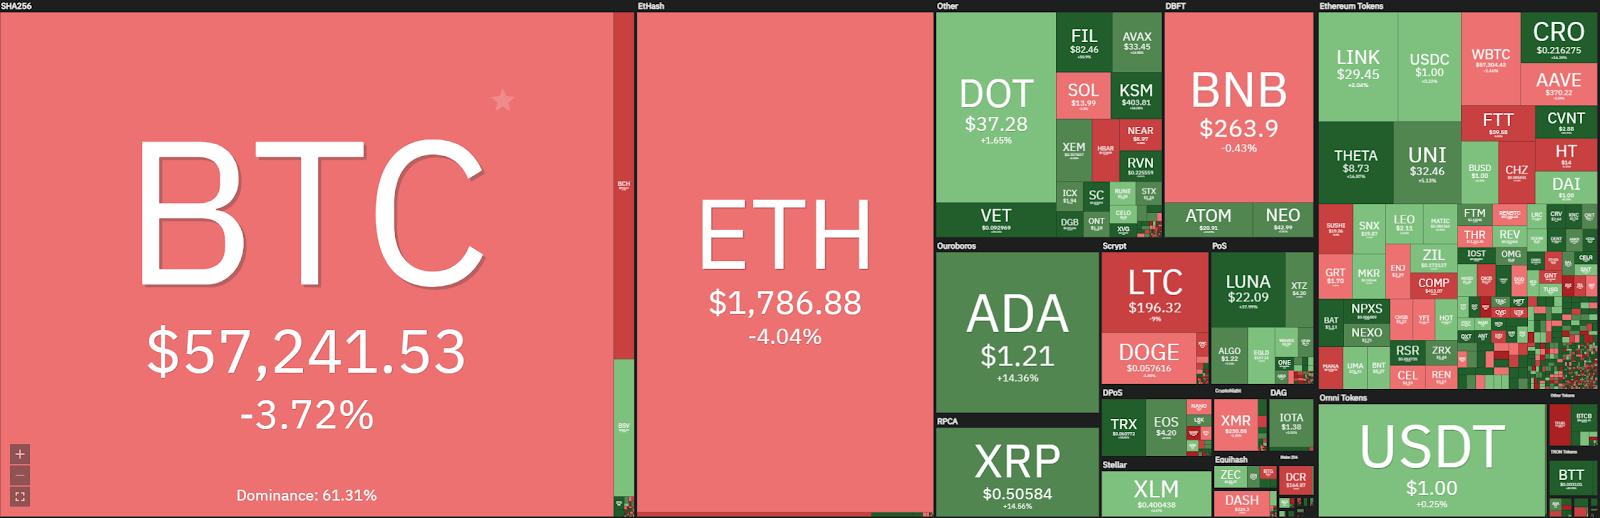 Weekly Crypto Price Analysis 21st Mar: BTC, ETH, XRP, DOT, UNI 1